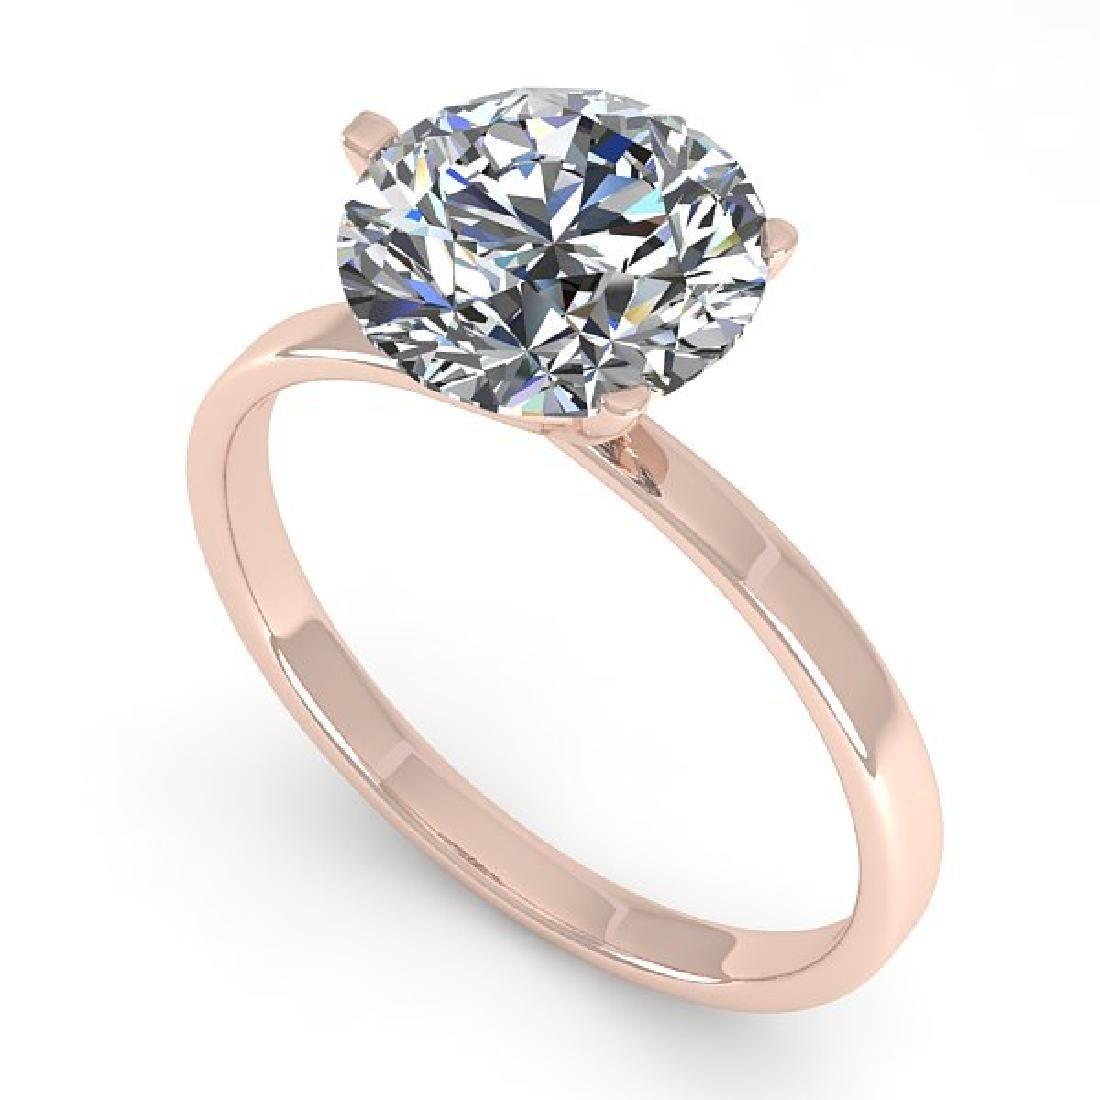 2.01 CTW Certified VS/SI Diamond Engagement Ring 14K